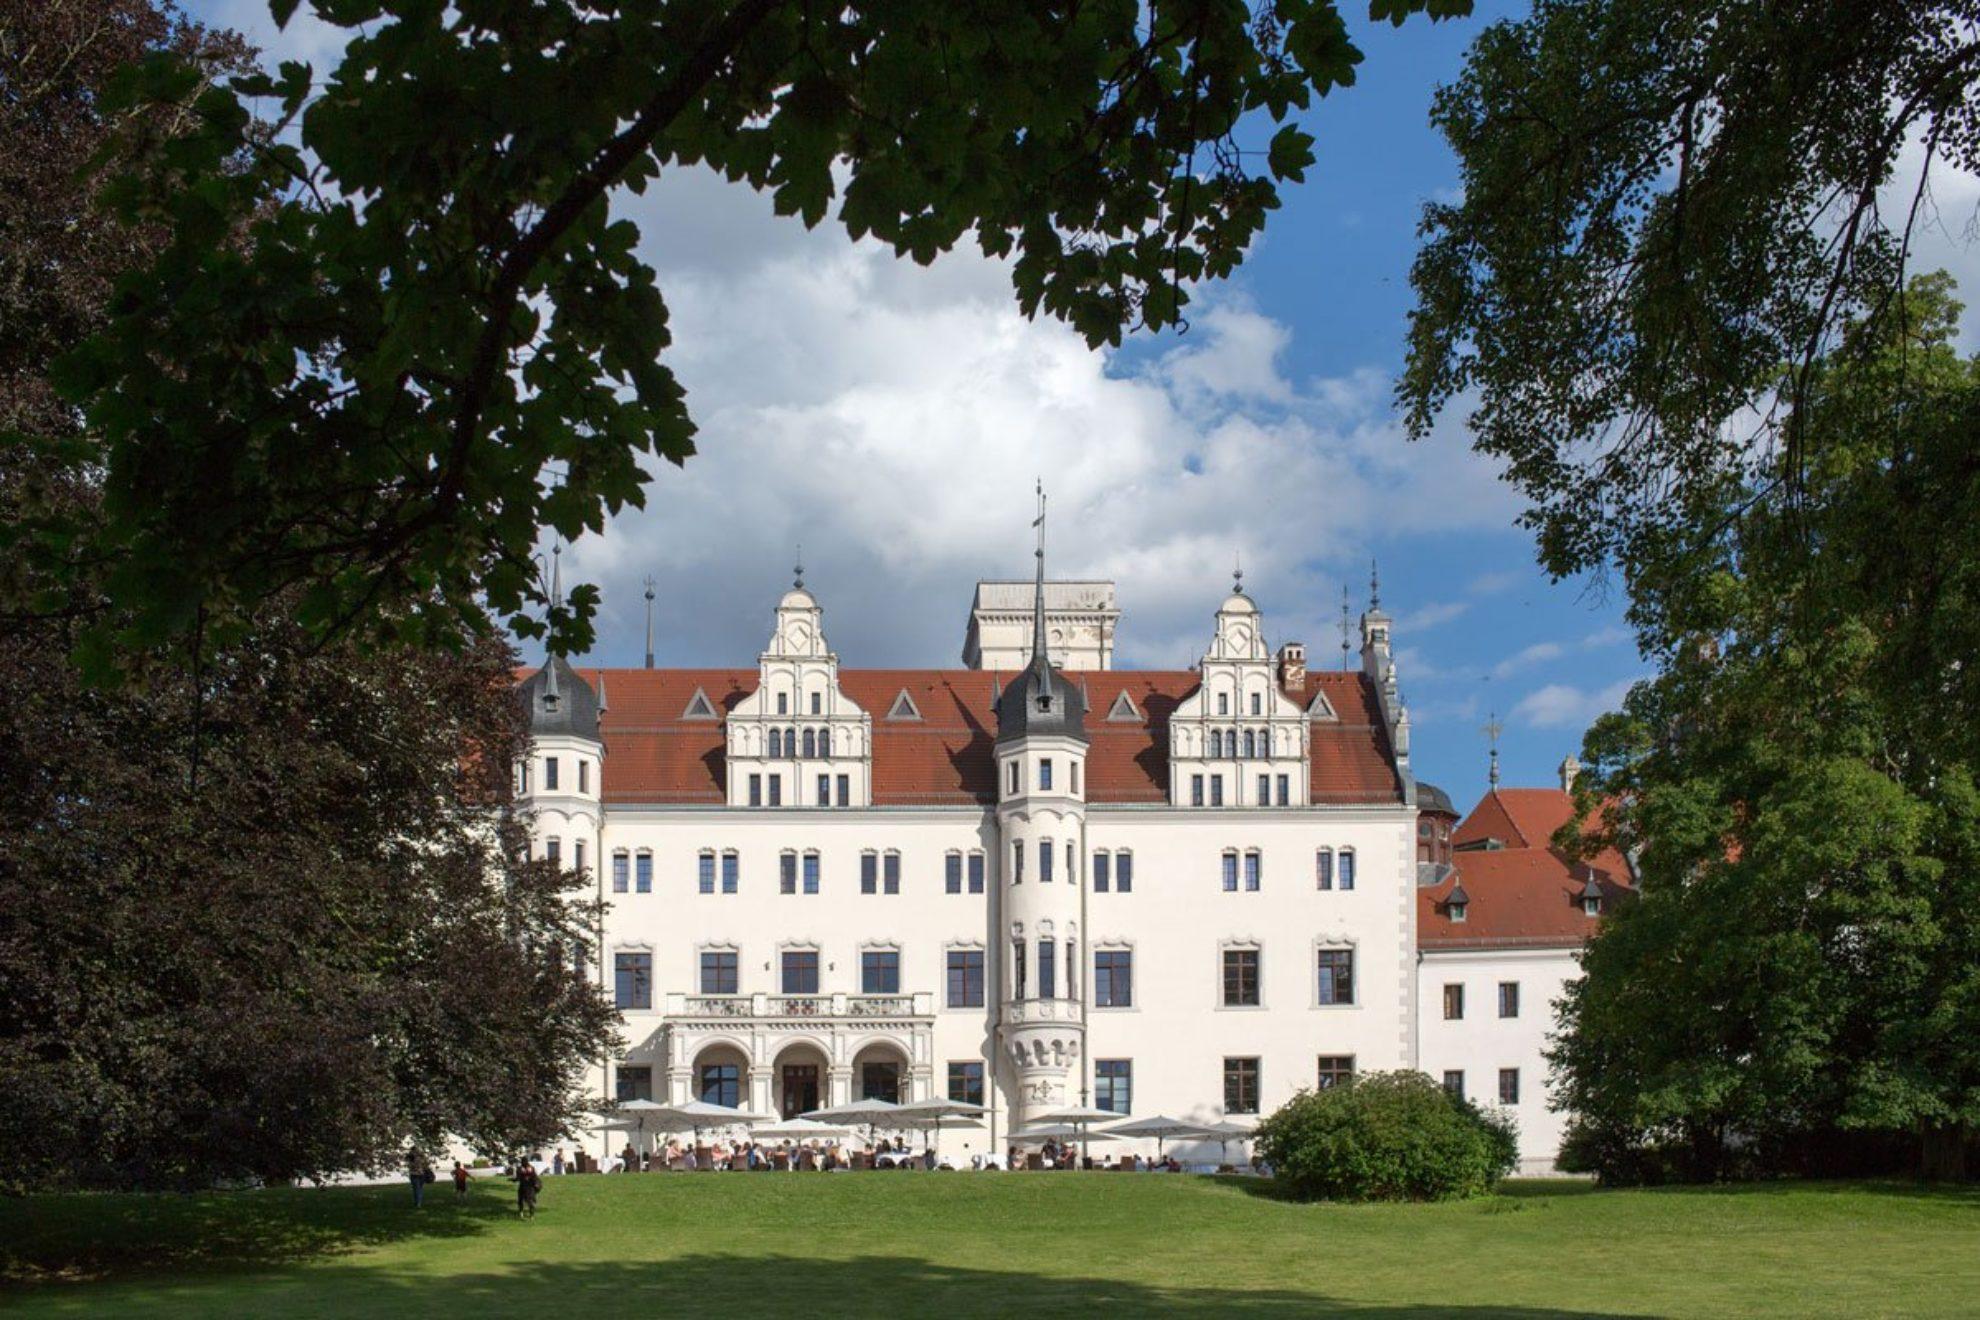 Hochzeit Schloss Boitzenburg